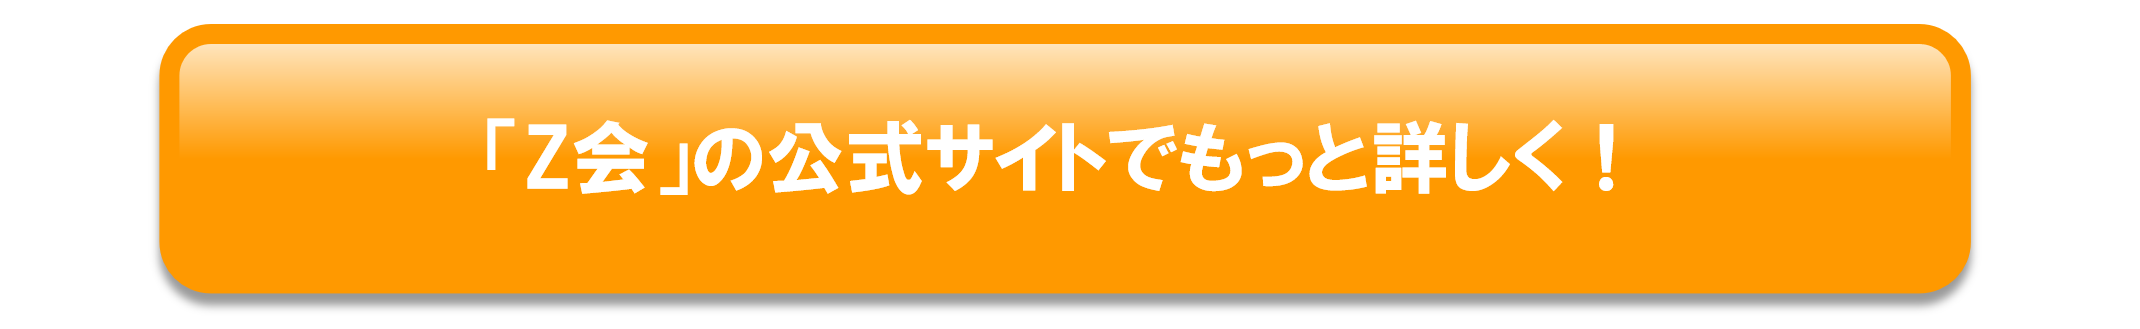 Z会公式へのリンクボタン